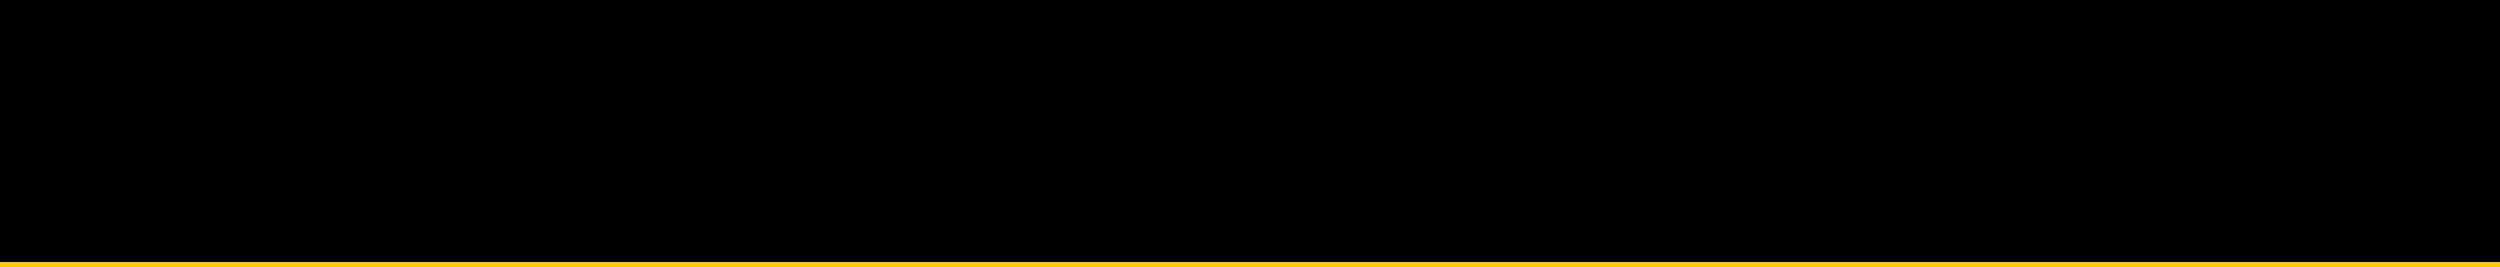 tangier-island-titles3.png